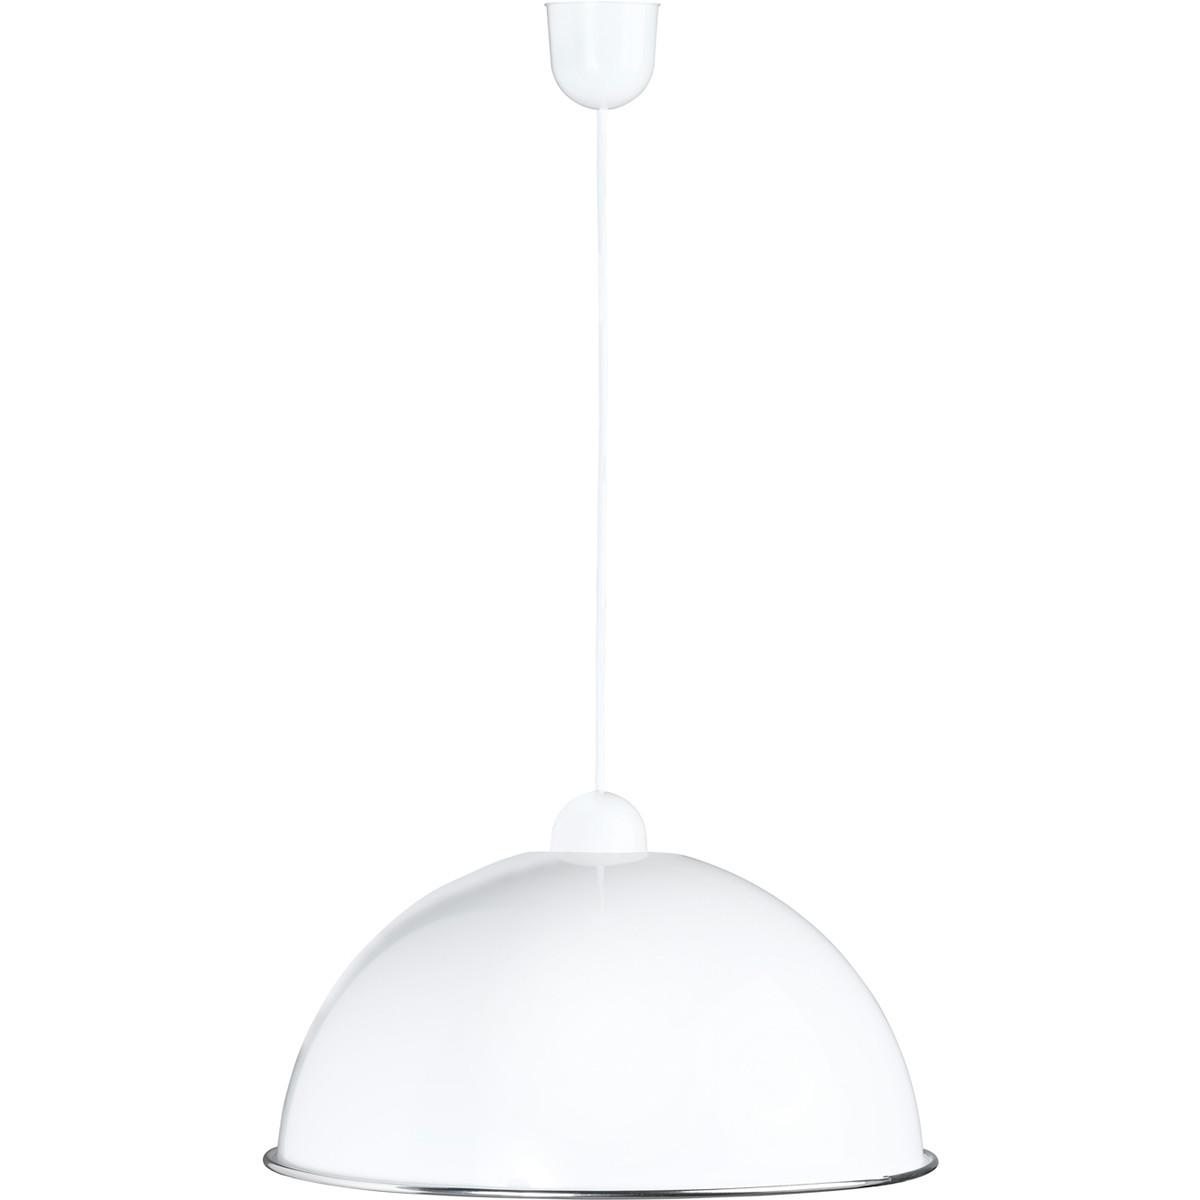 LED Hanglamp - Hangverlichting - Trion Fonko - E27 Fitting - Rond - Mat Wit - Kunststof